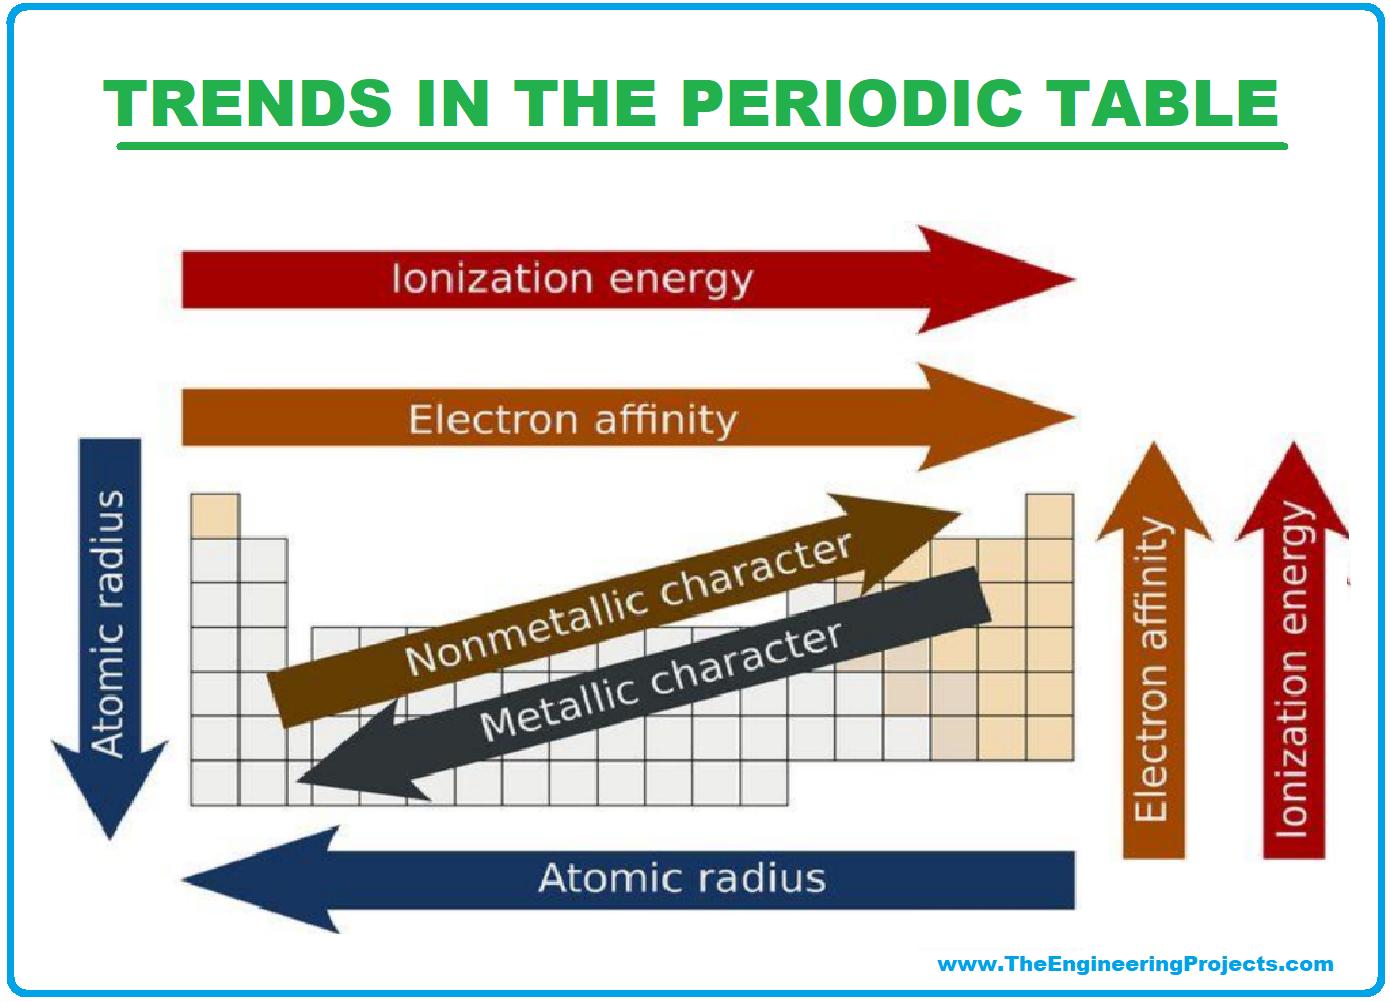 History of Periodic Table, Periodic Table, periodic table deifnition, trends in periodic table, trends of periodic table, periodic table trends